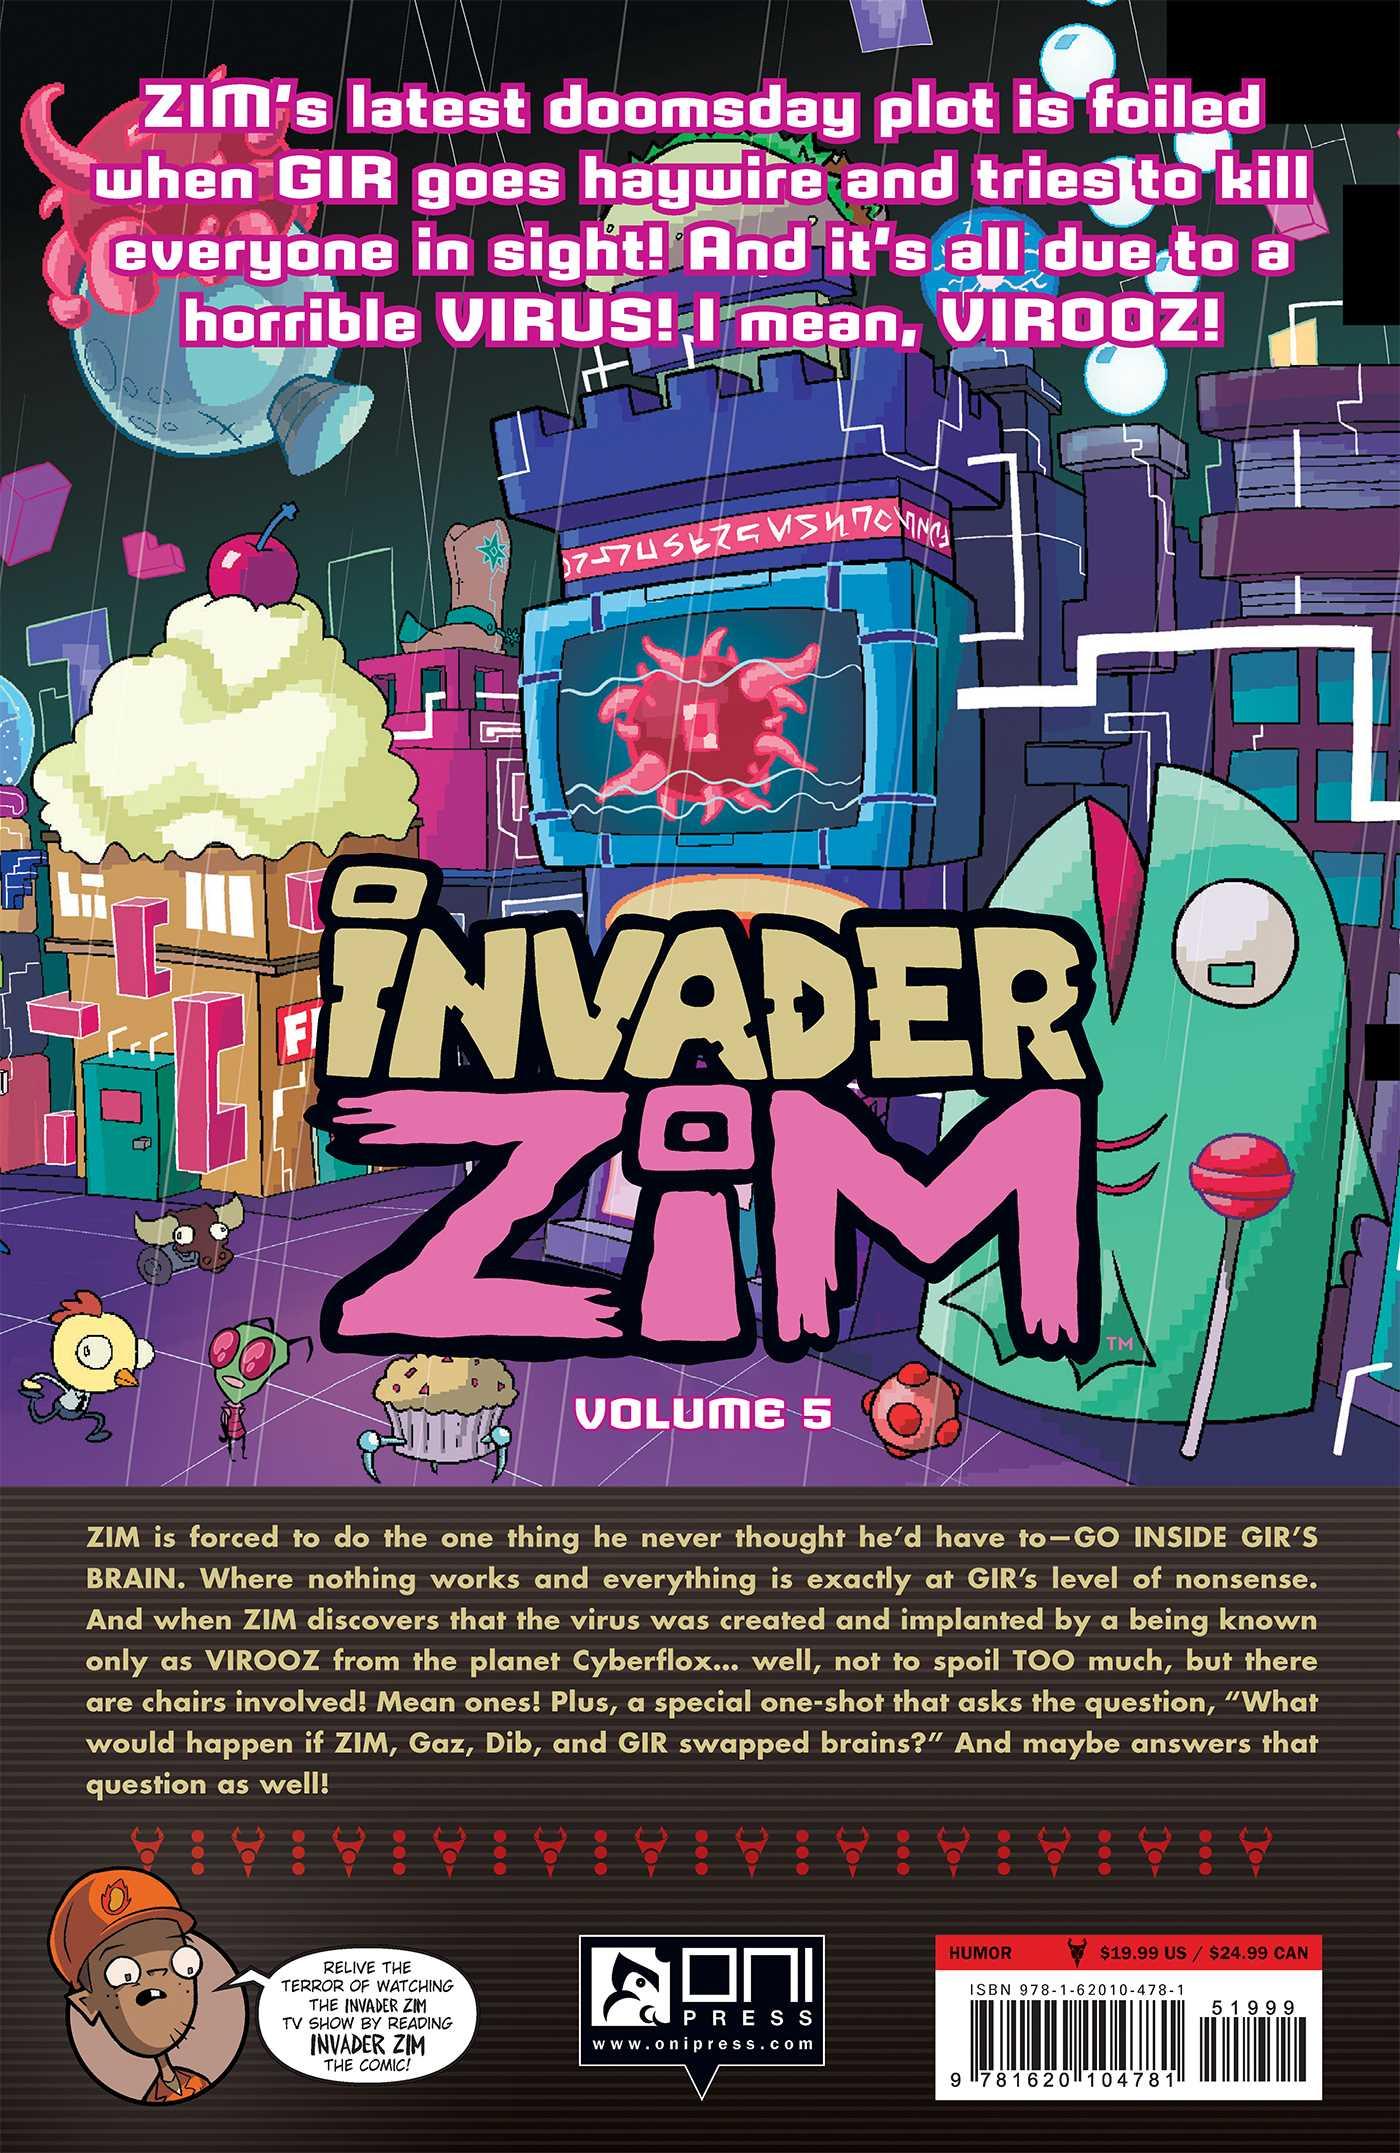 invader zim vol 5 book by eric trueheart dave crosland jhonen